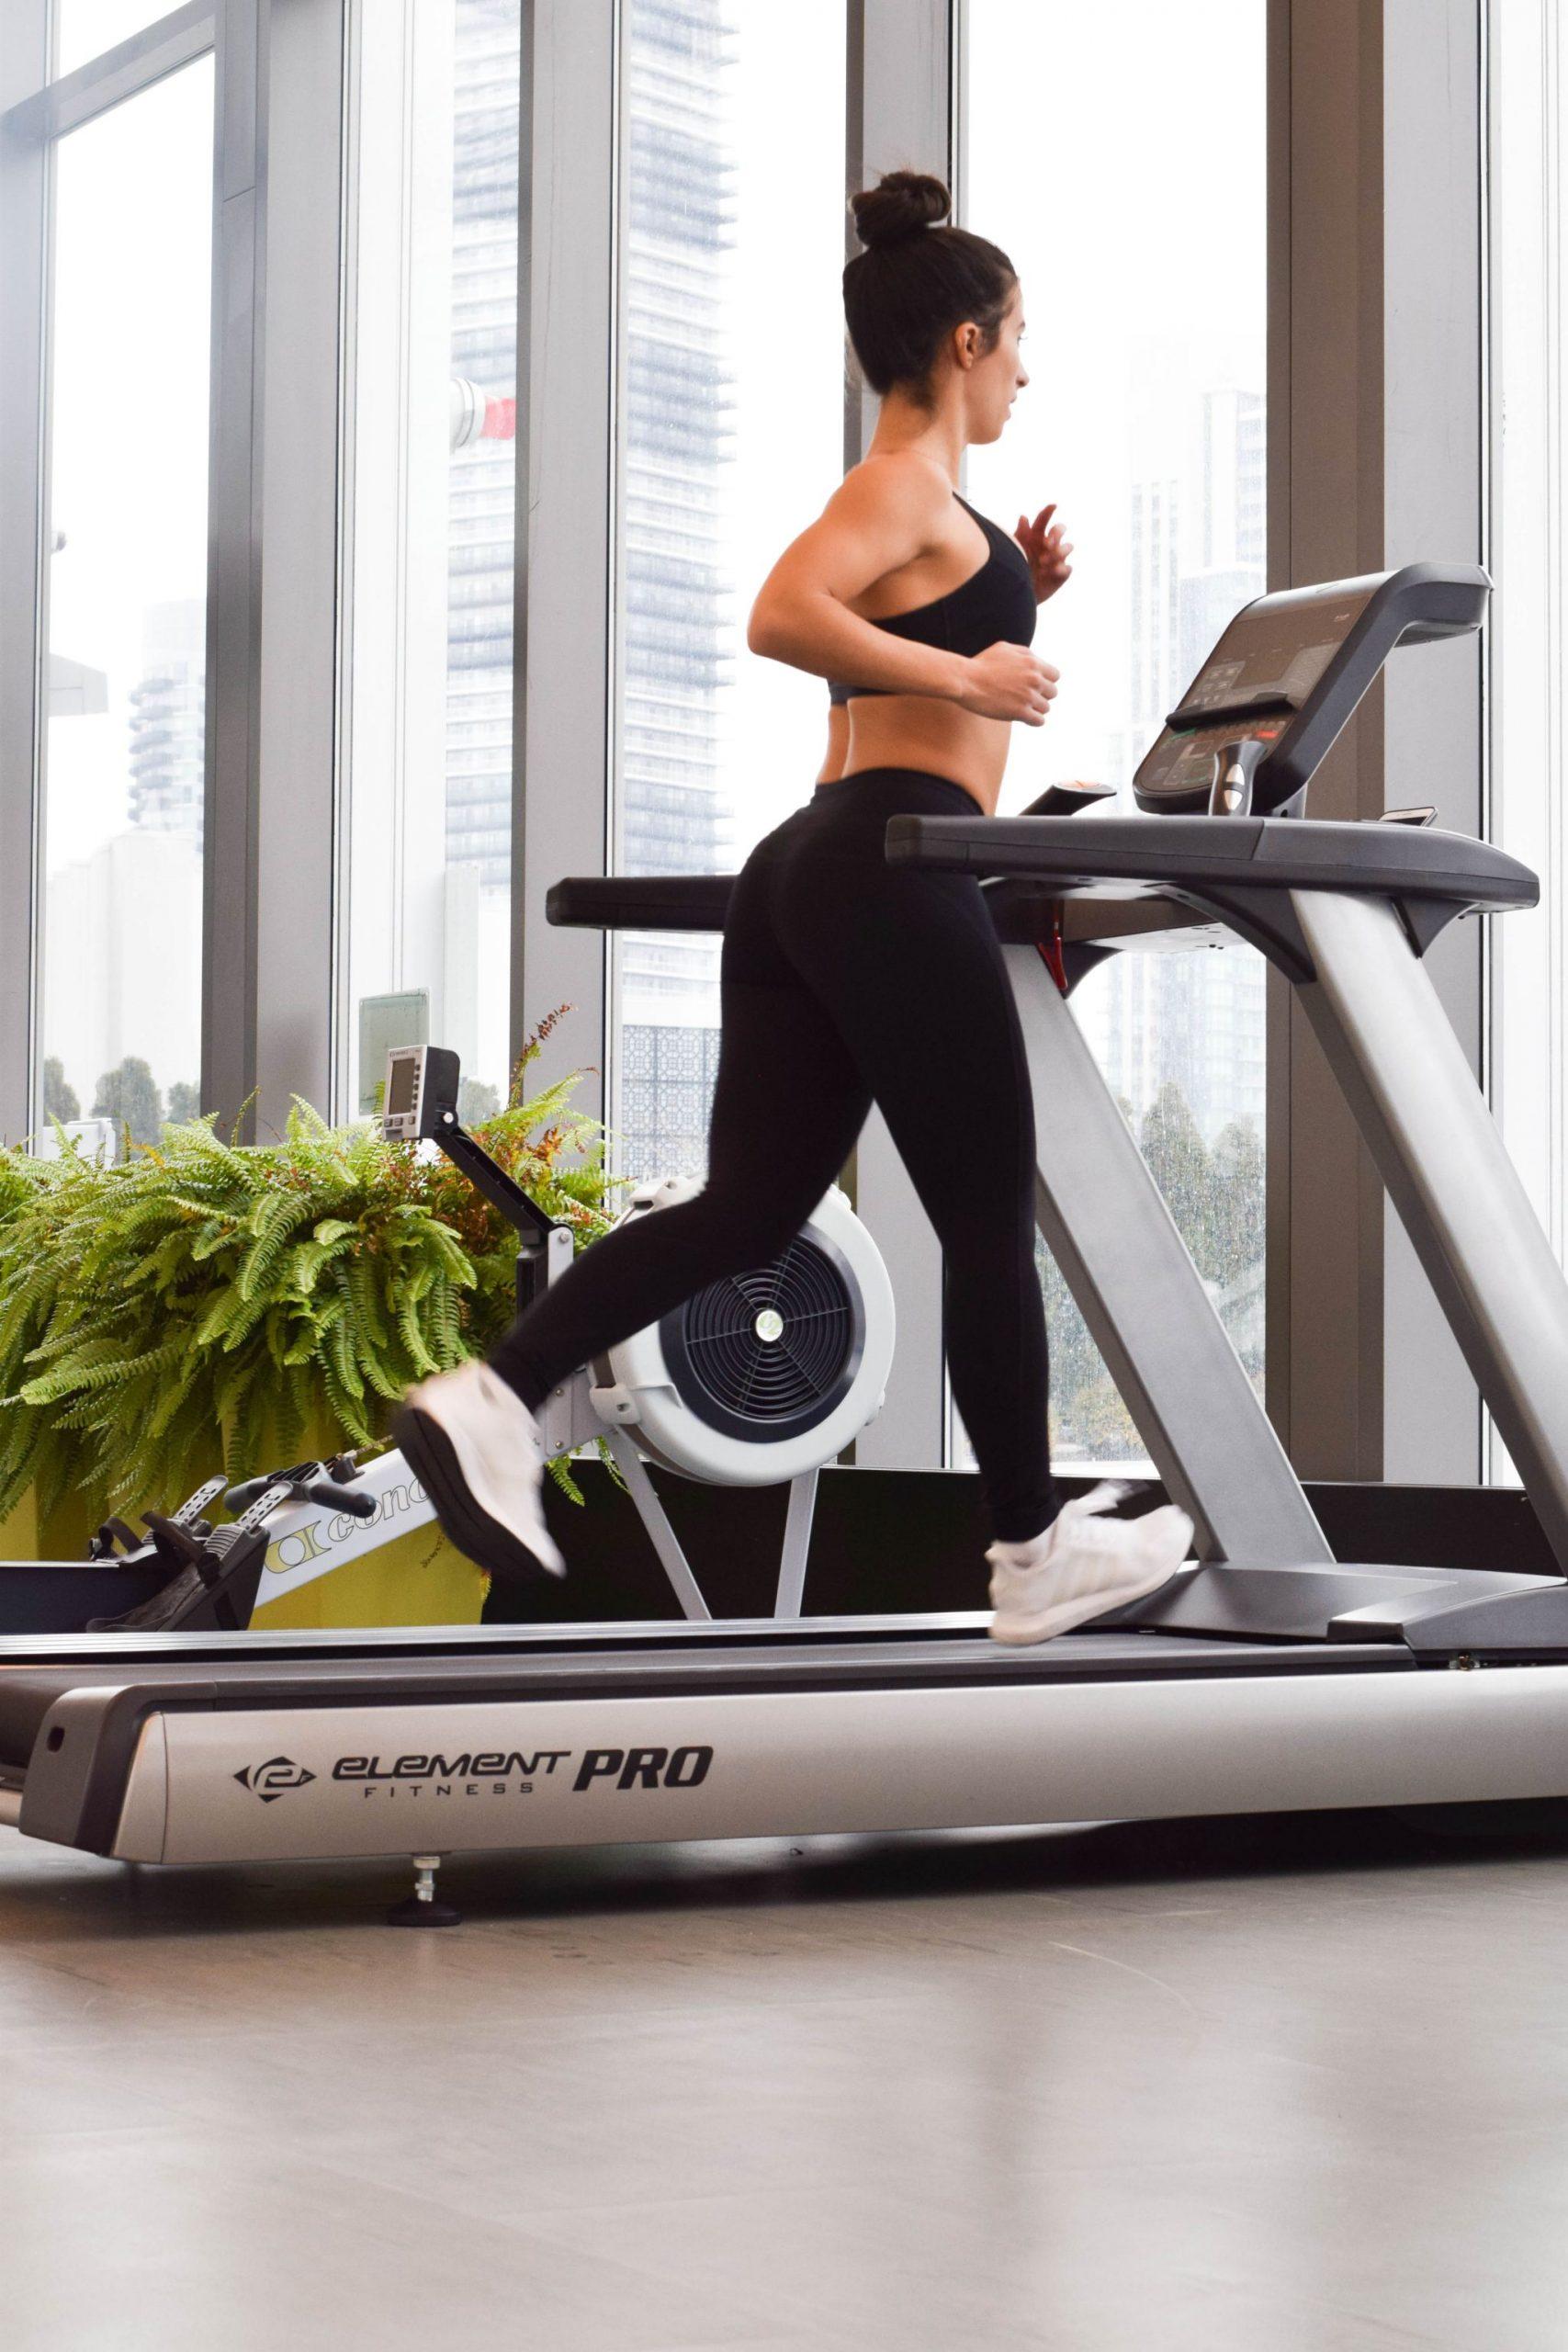 Fitness: Warming Up + Interval Running On The Treadmill